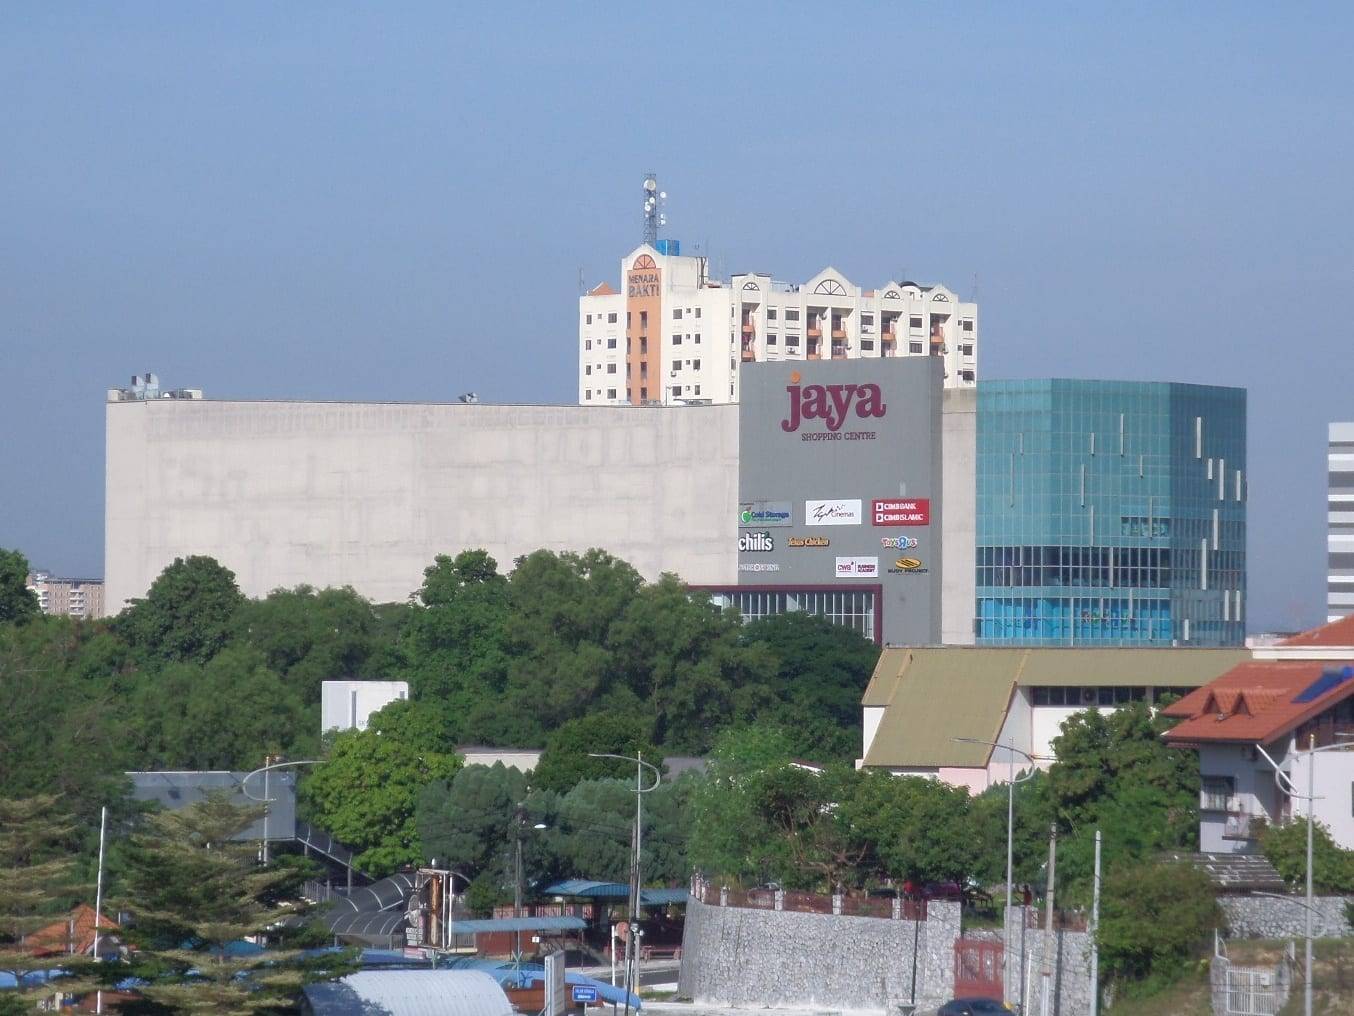 Centro Comercial Jaya Petaling Jaya Malasia